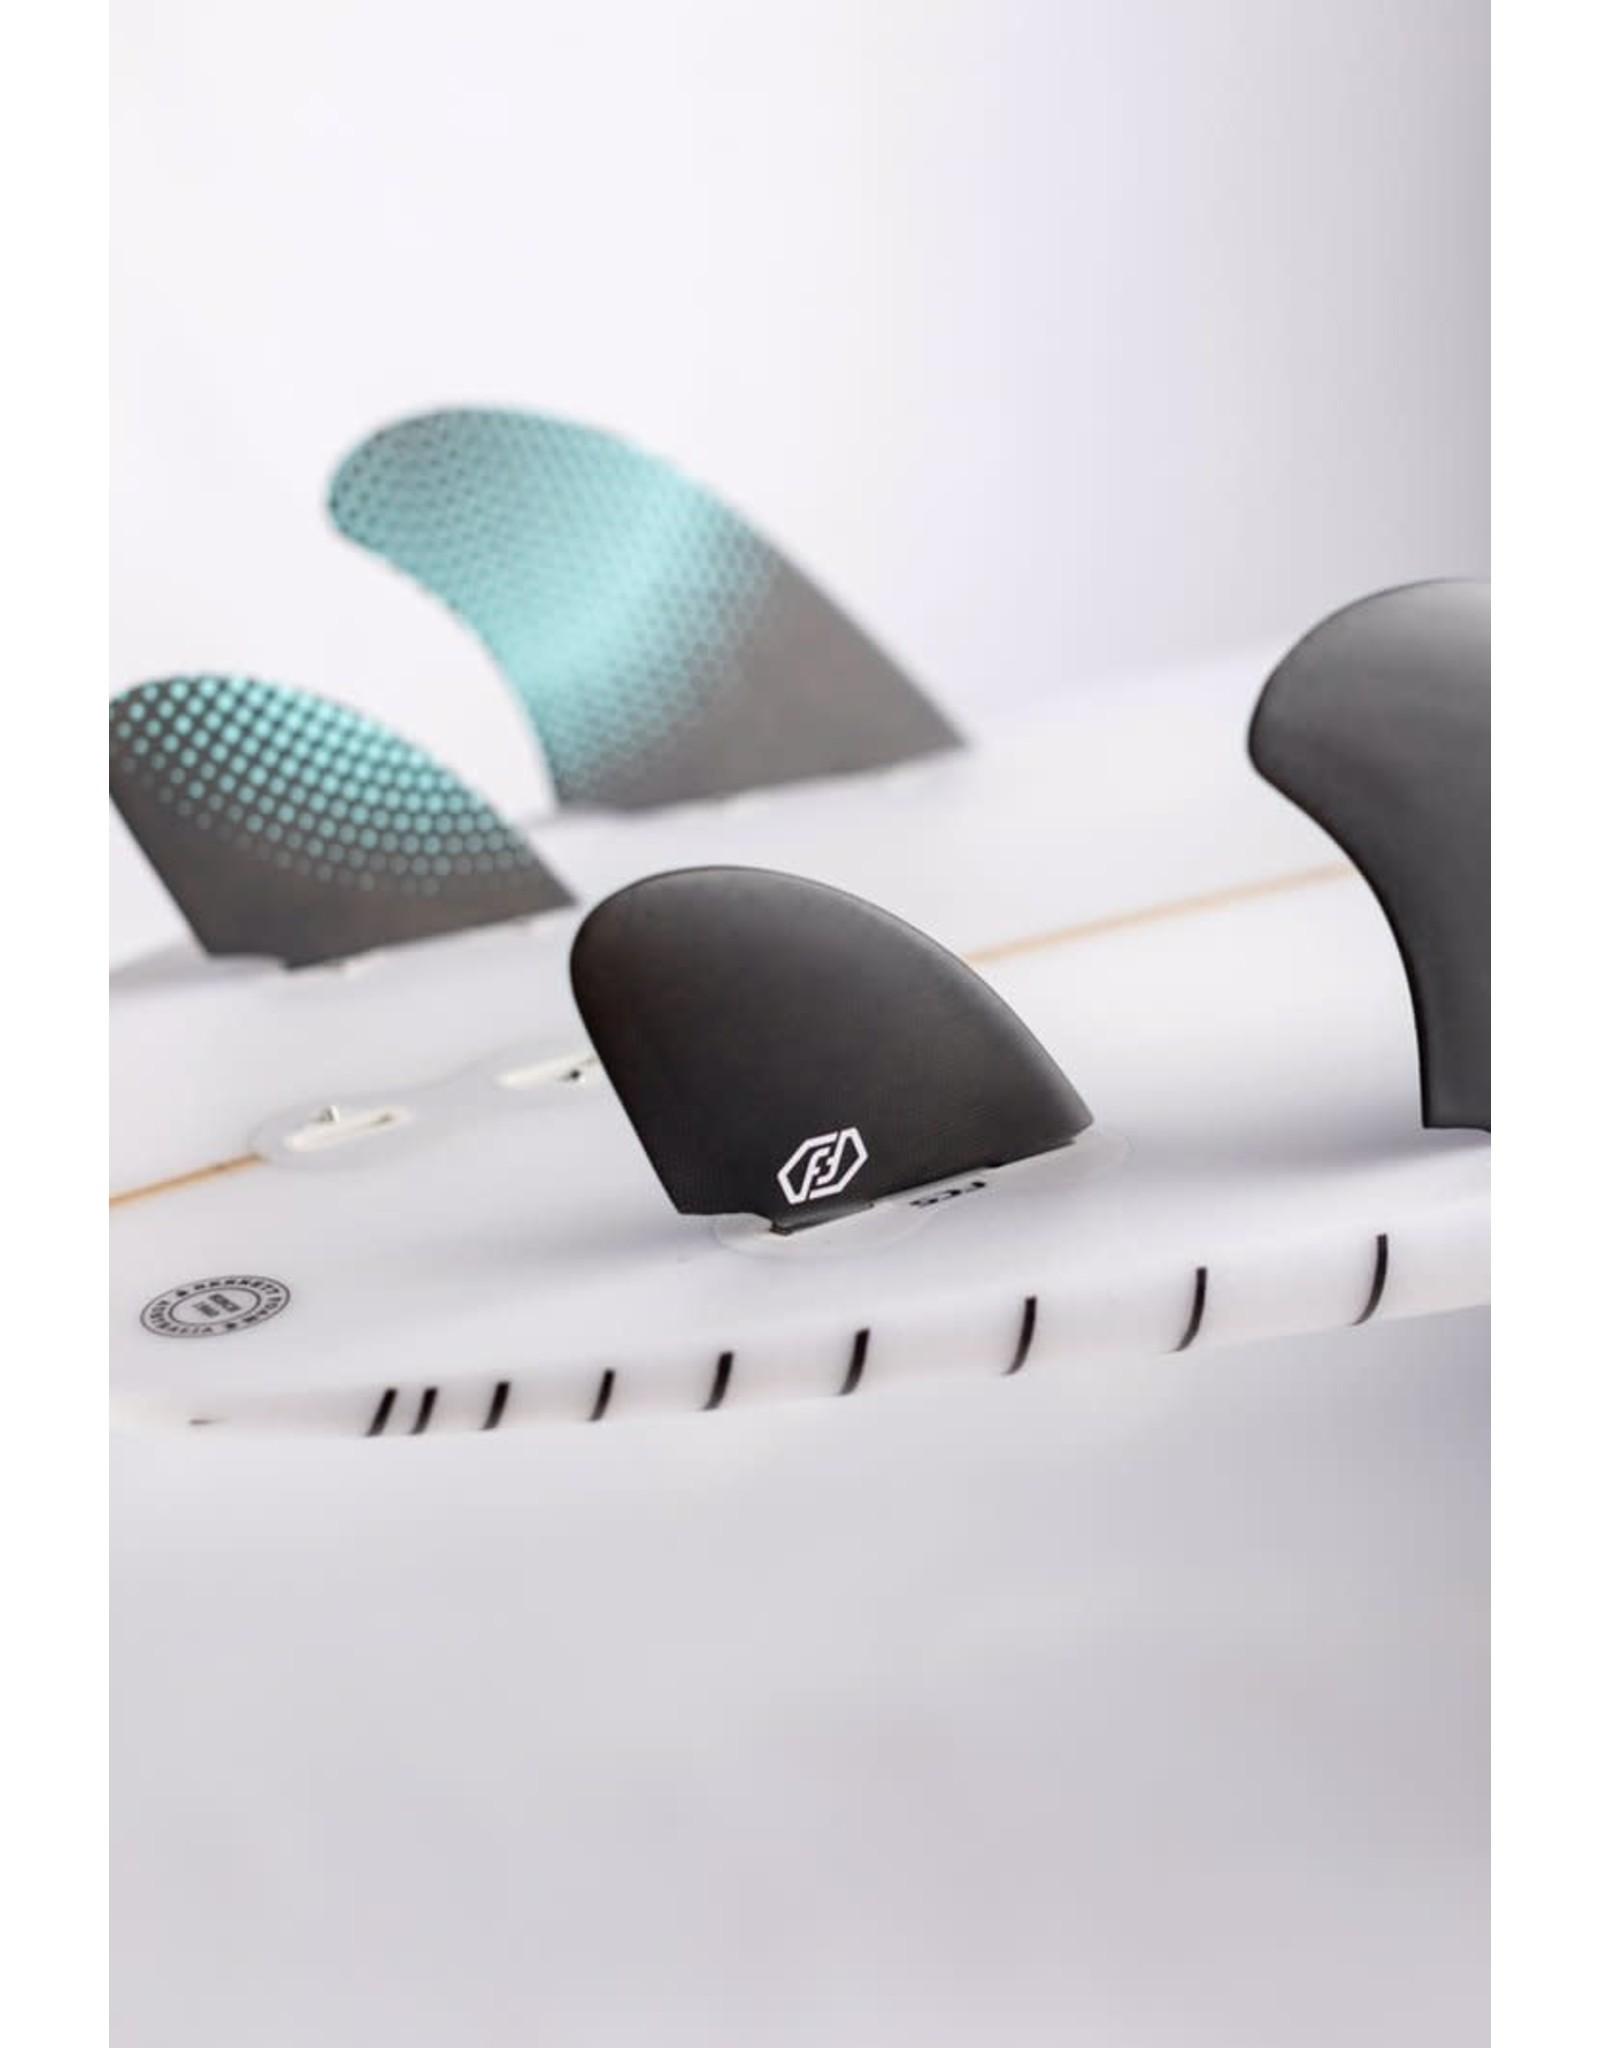 Feather Fins Feather Fins FCS Dual Tab Twin Quad Semi Keel